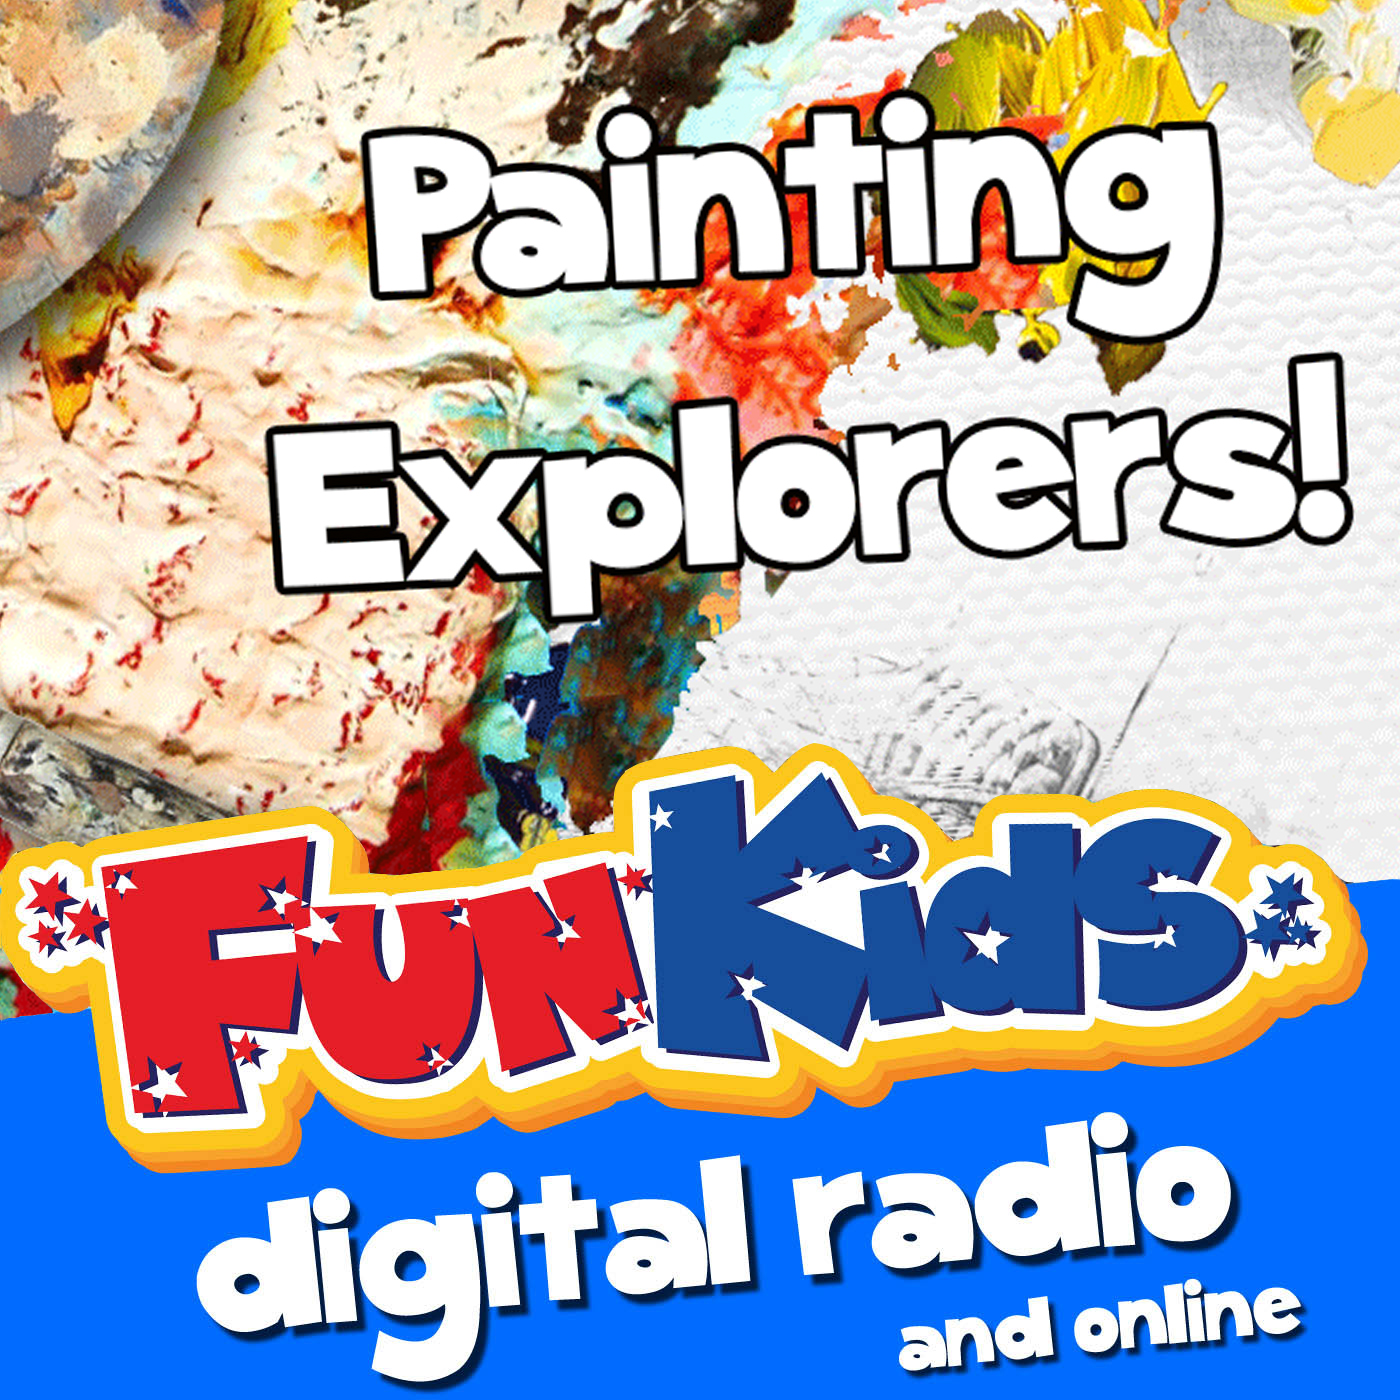 PaintingExplorers